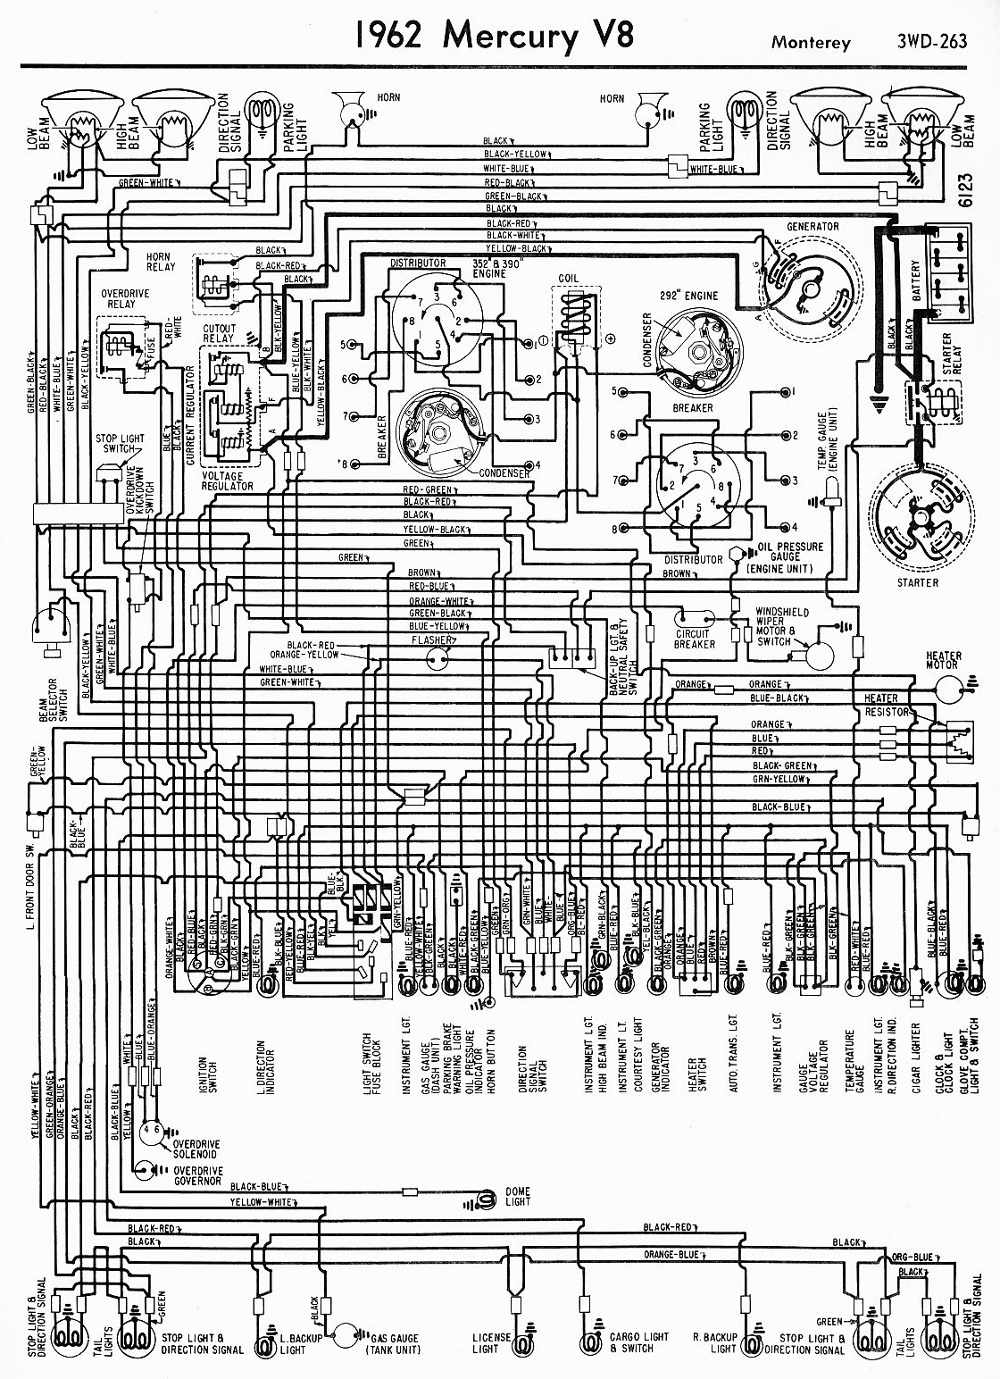 Vehicle Wiring Diagrams For Mercury Monterey Not Lossing Smartcraft Diagram 200 2014 1956 Trusted Rh 36 Nl Schoenheitsbrieftaube De 115